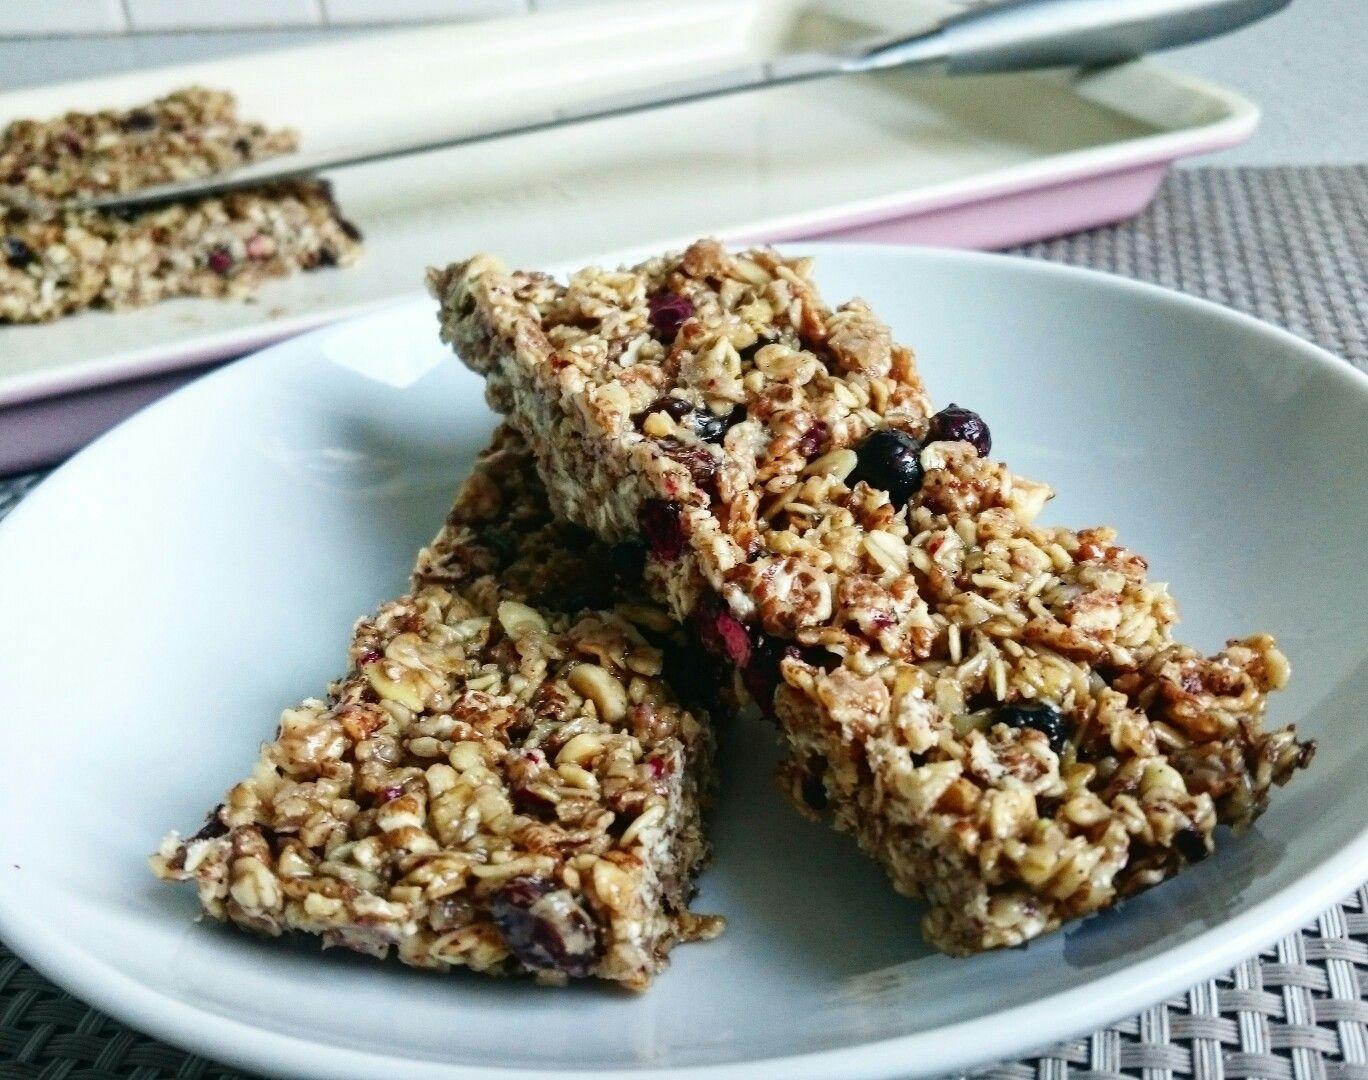 Revitalising granola bars. Homemade of course